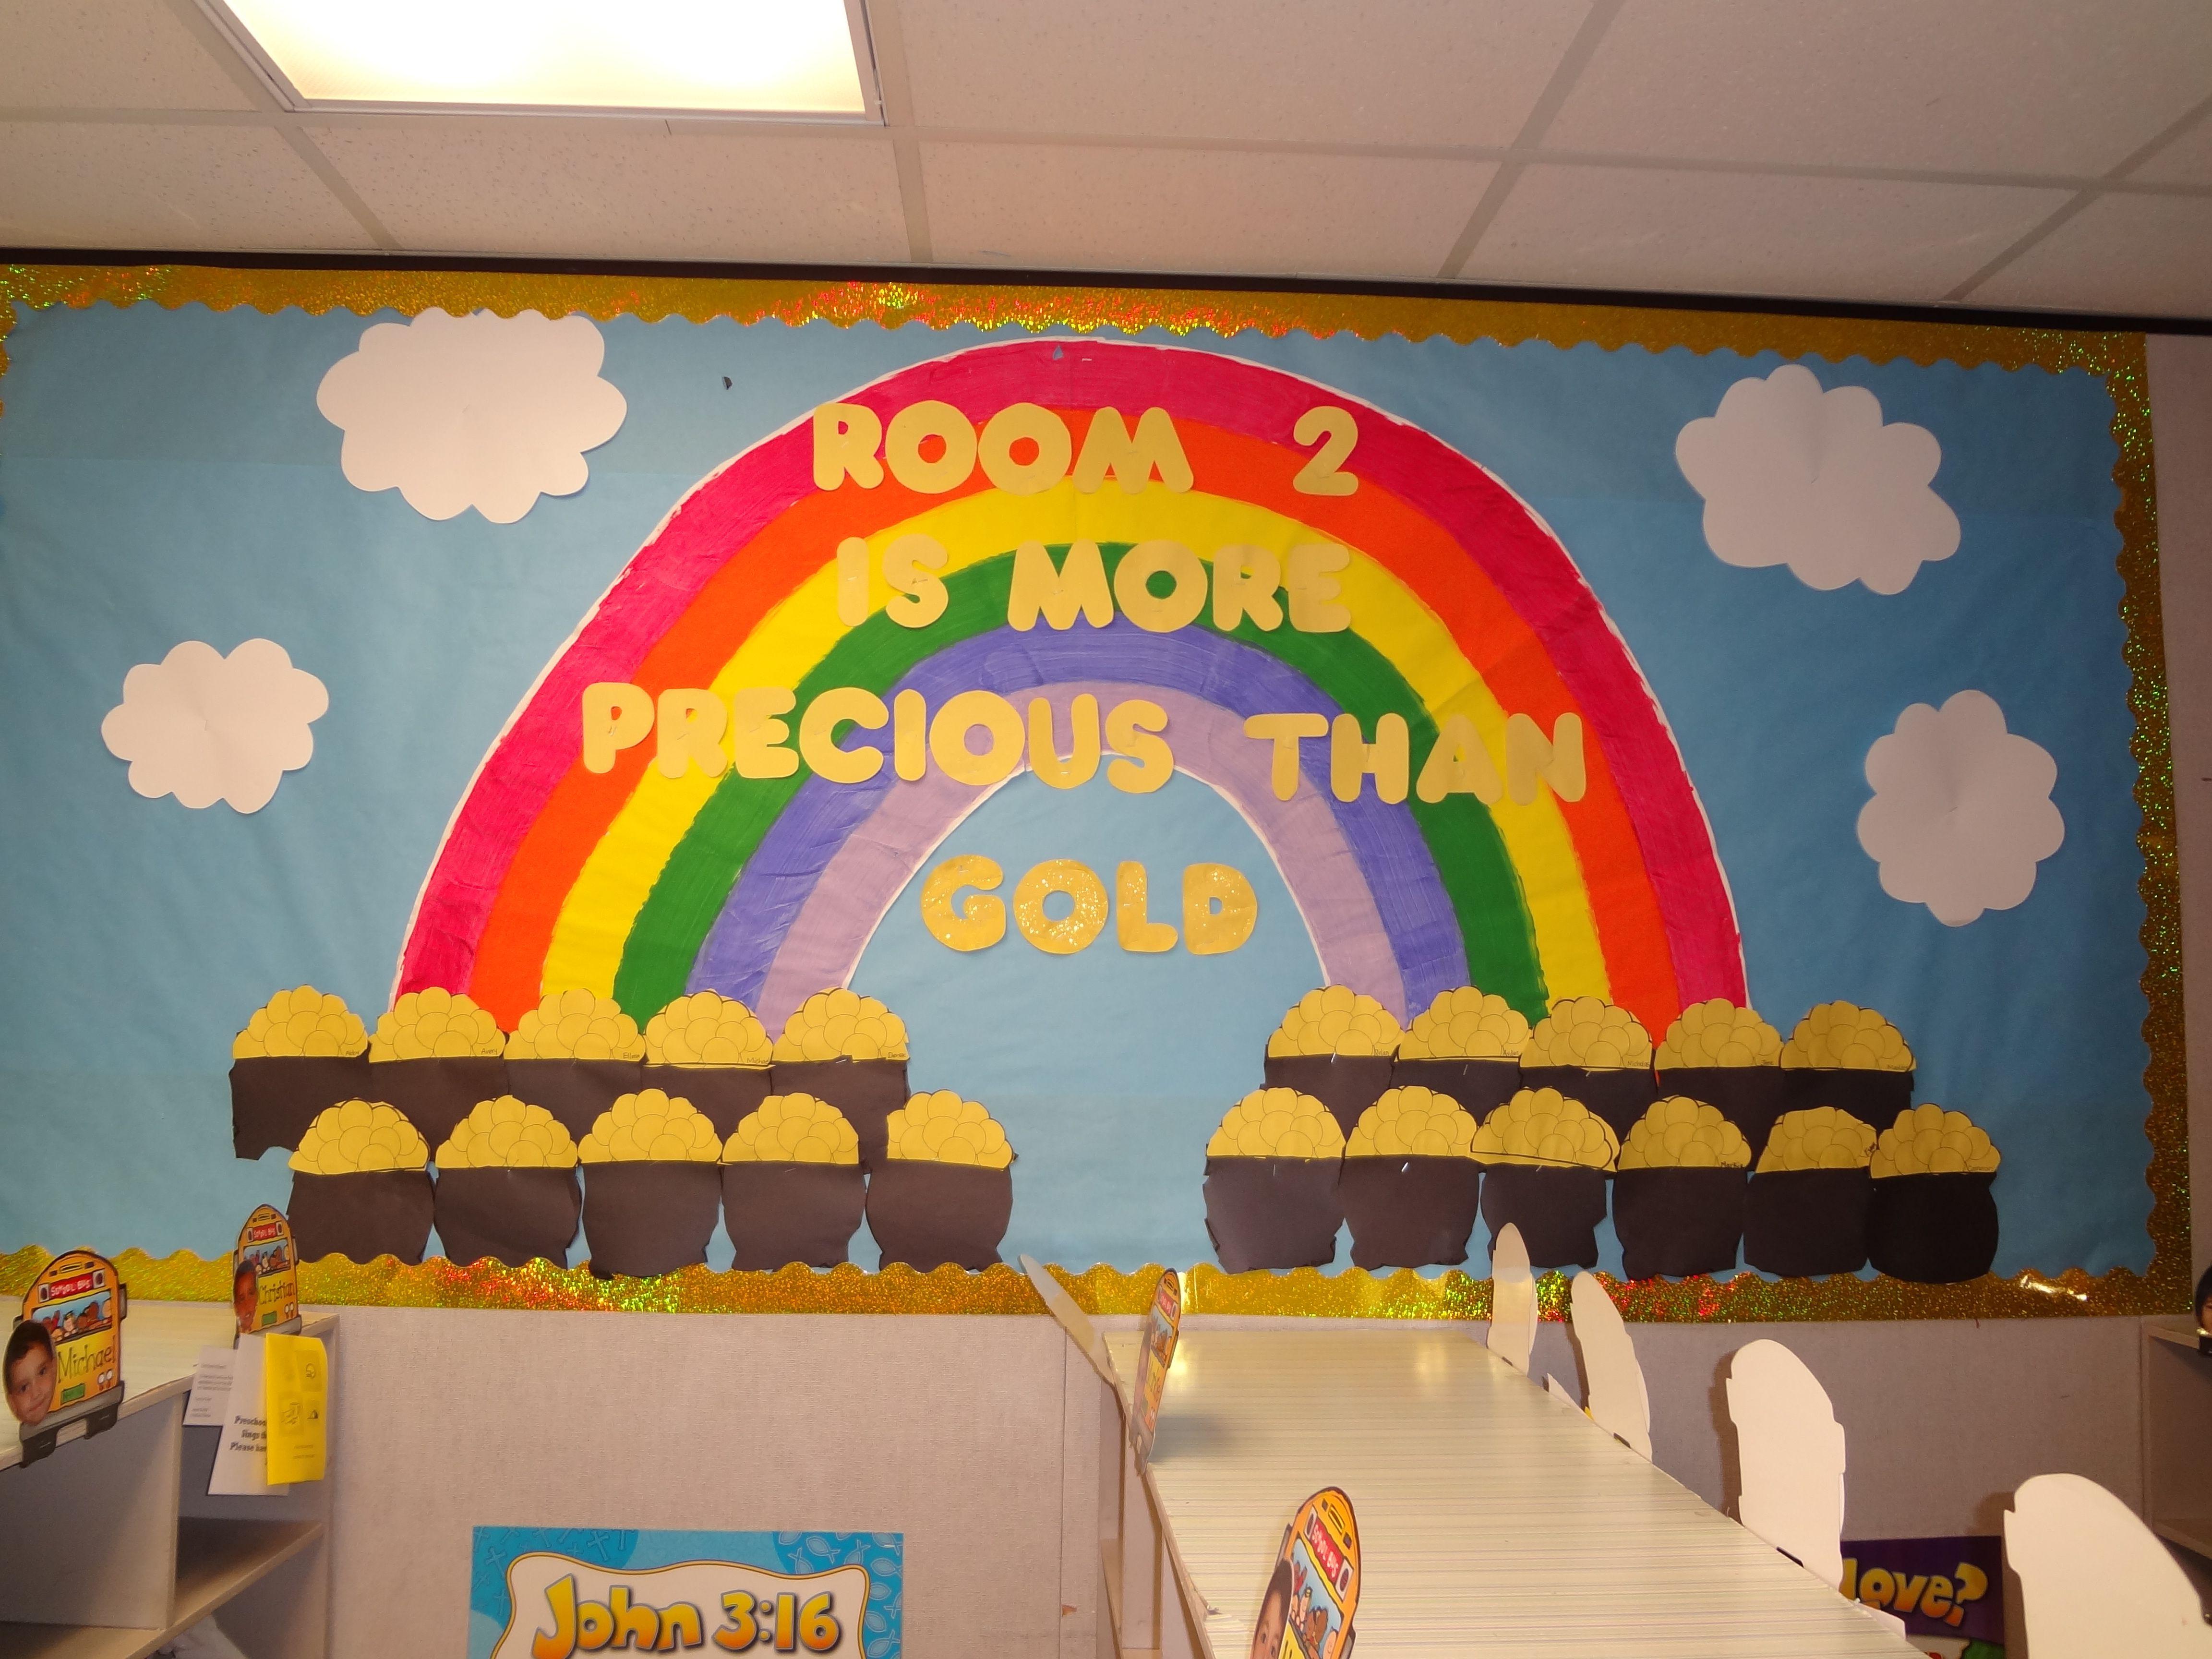 Room 2 is more precious than gold bulletin board